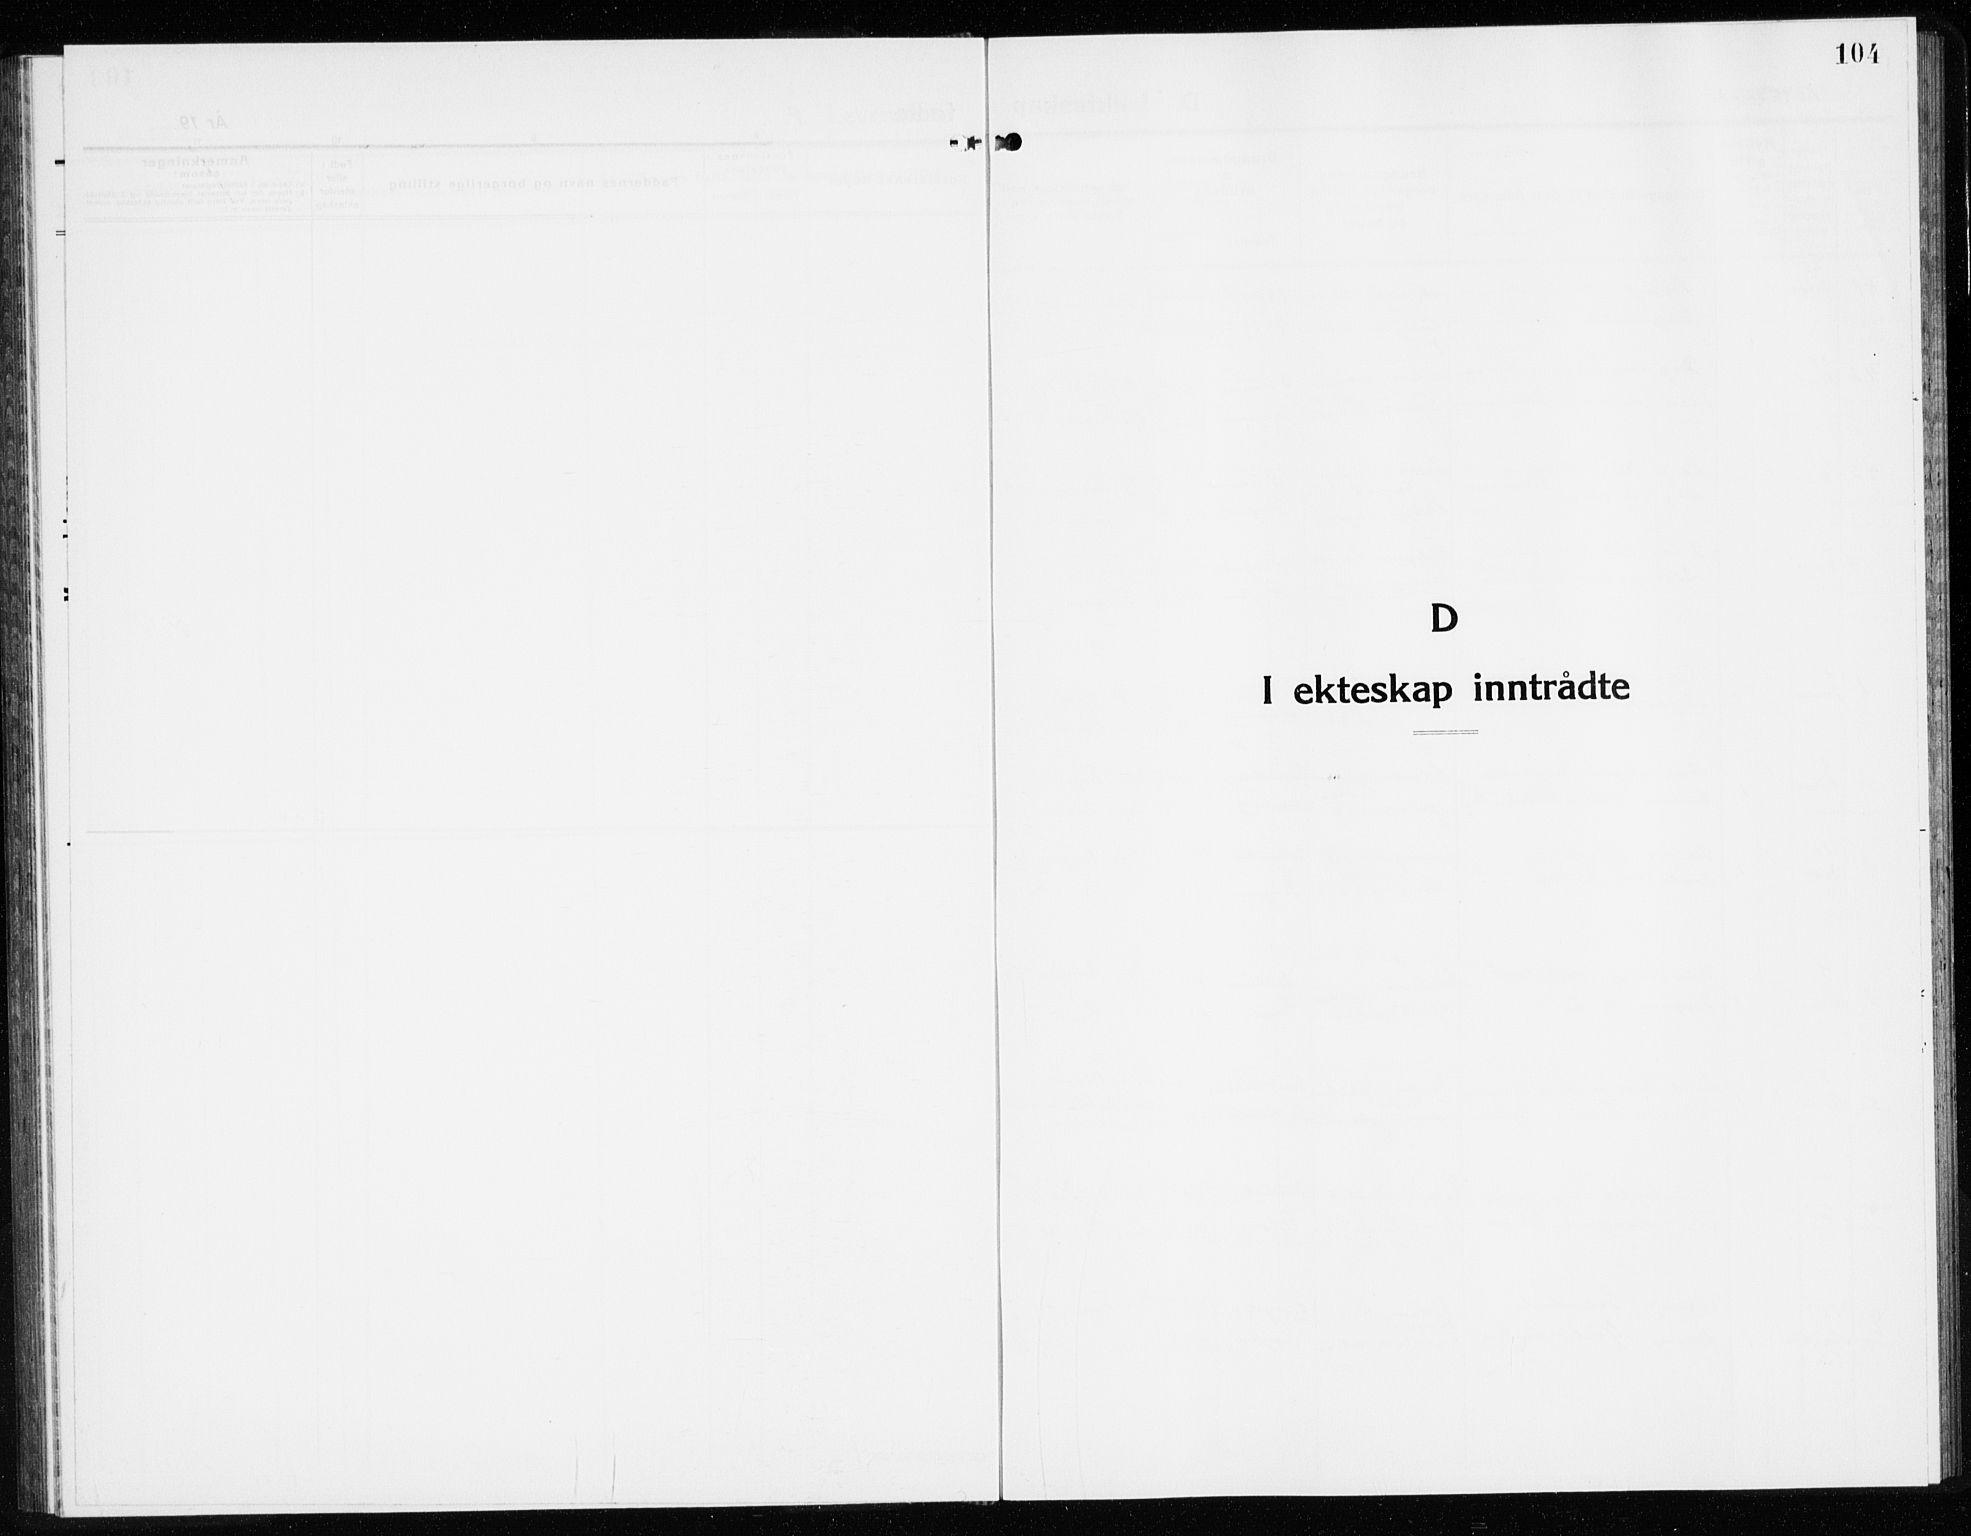 SAKO, Lier kirkebøker, G/Gb/L0005: Klokkerbok nr. II 5, 1932-1942, s. 104